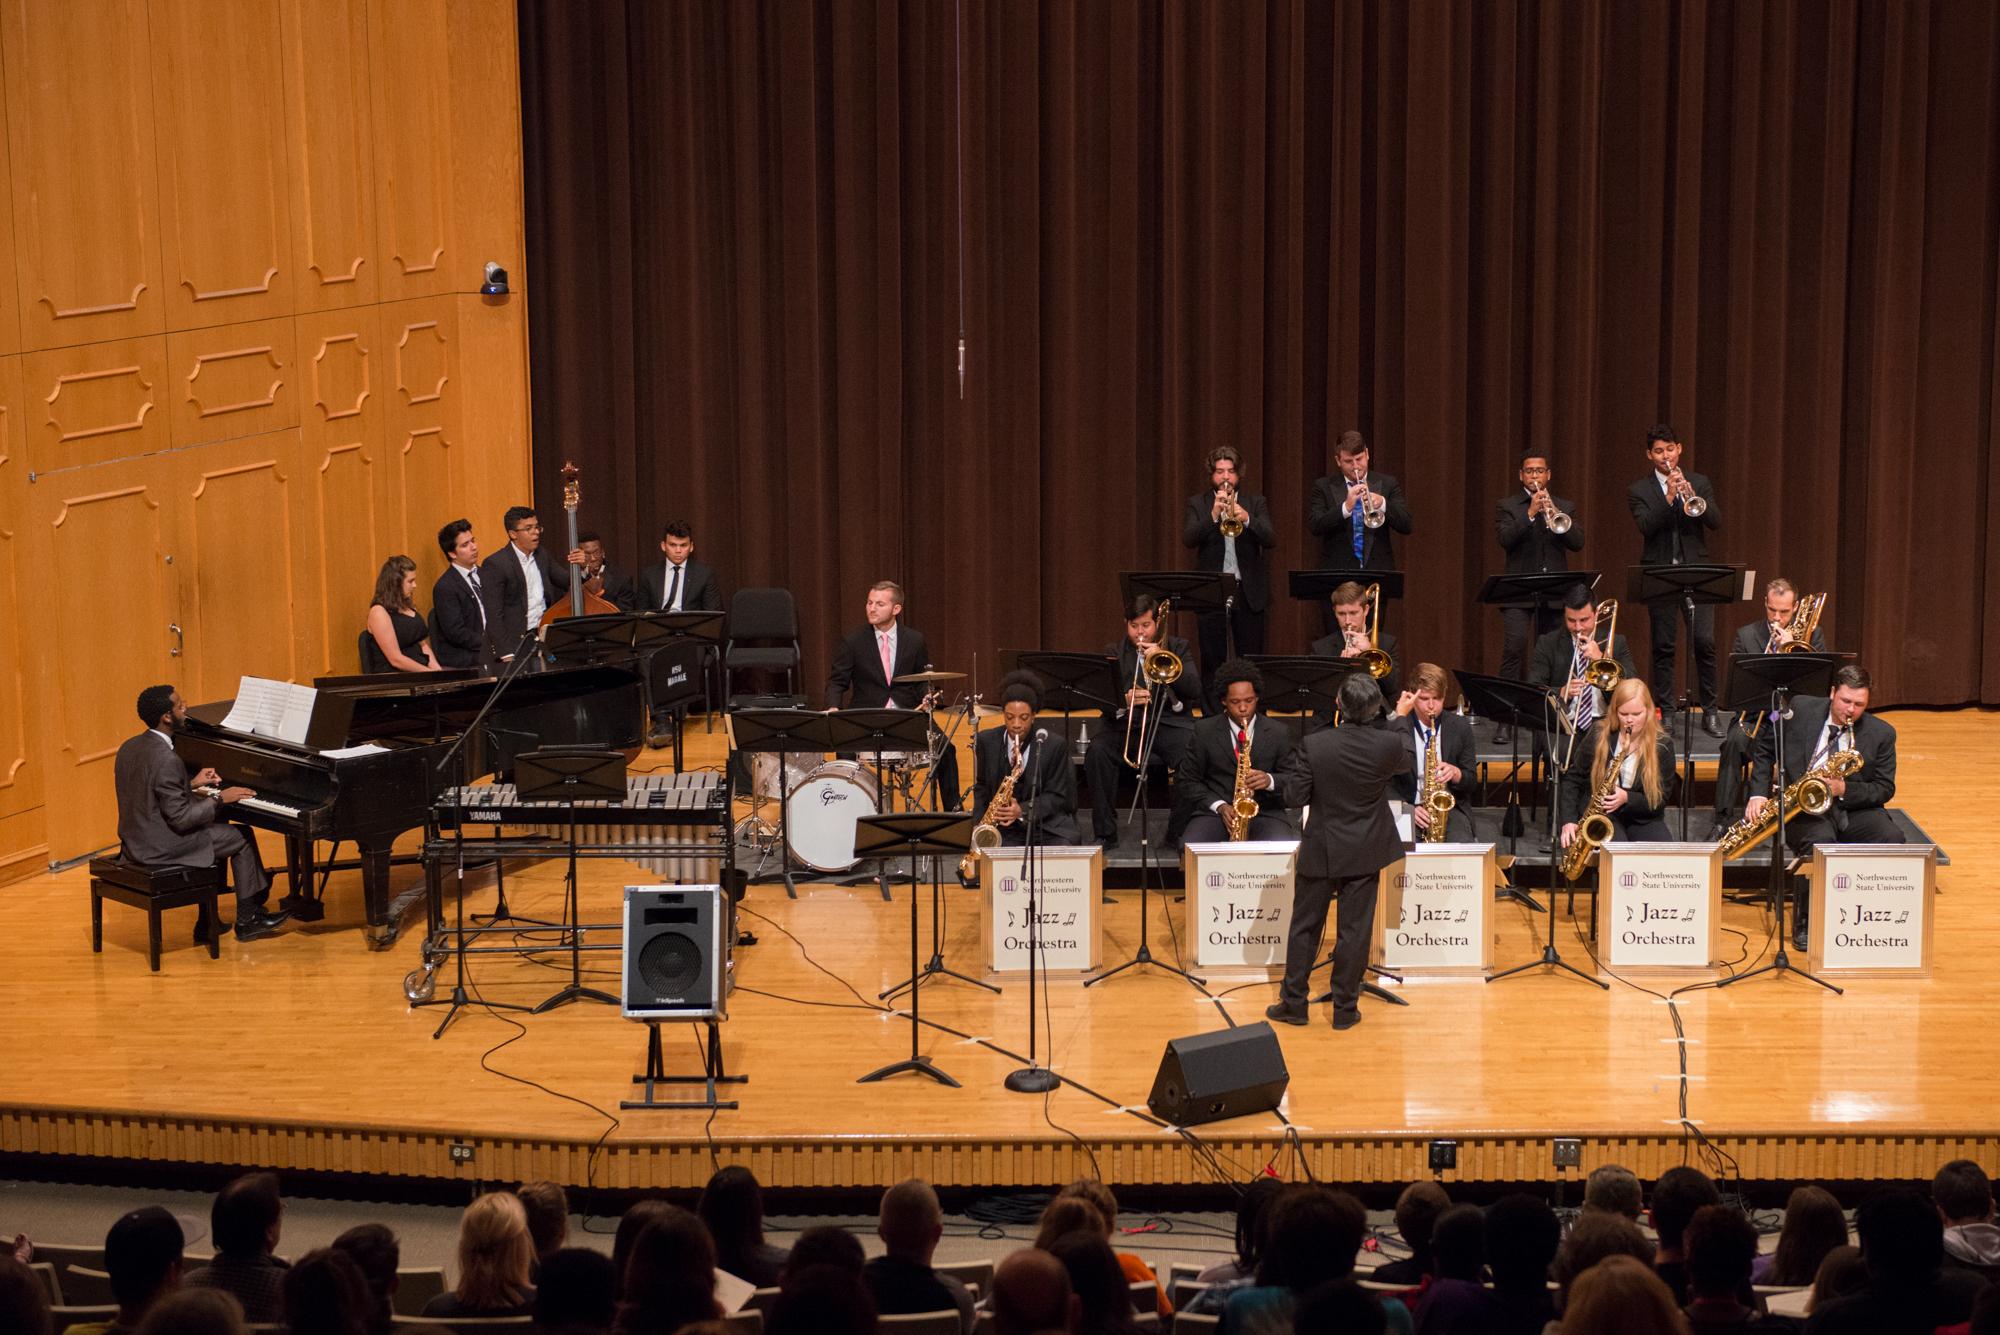 Nsu Jazz Orchestra To Perform Oct. 2 – Northwestern State Pertaining To Grambling State University Orchestra Calendar